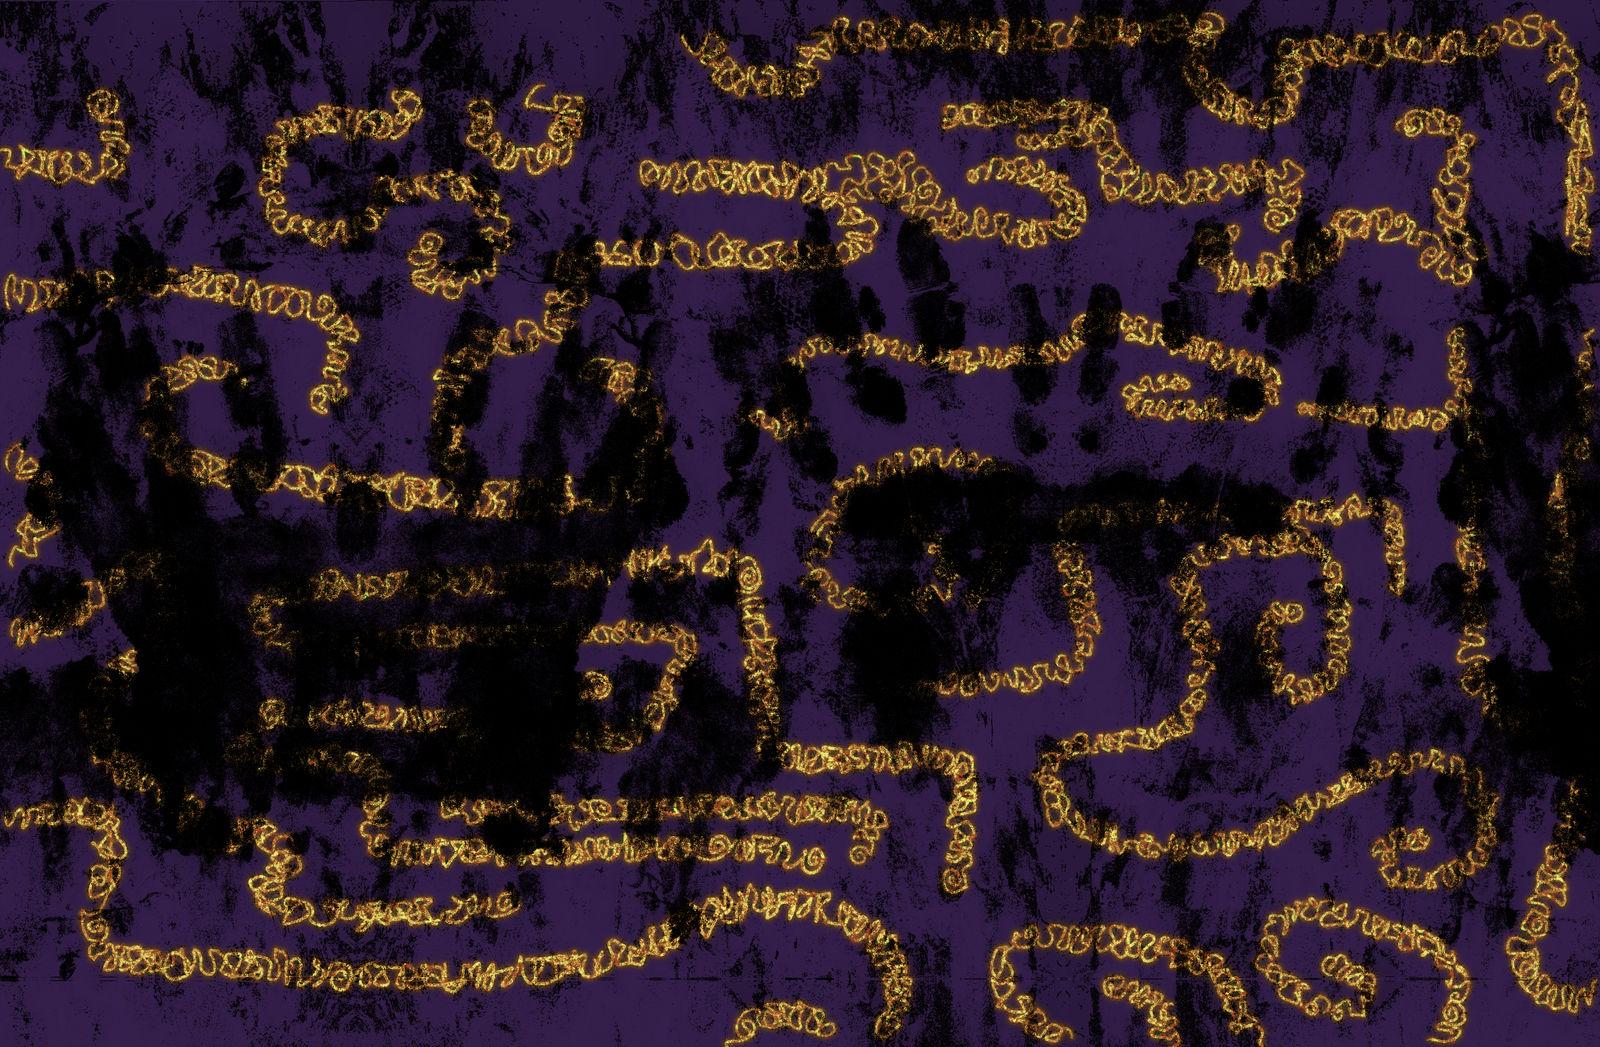 Panadagea Background by Anomalies13